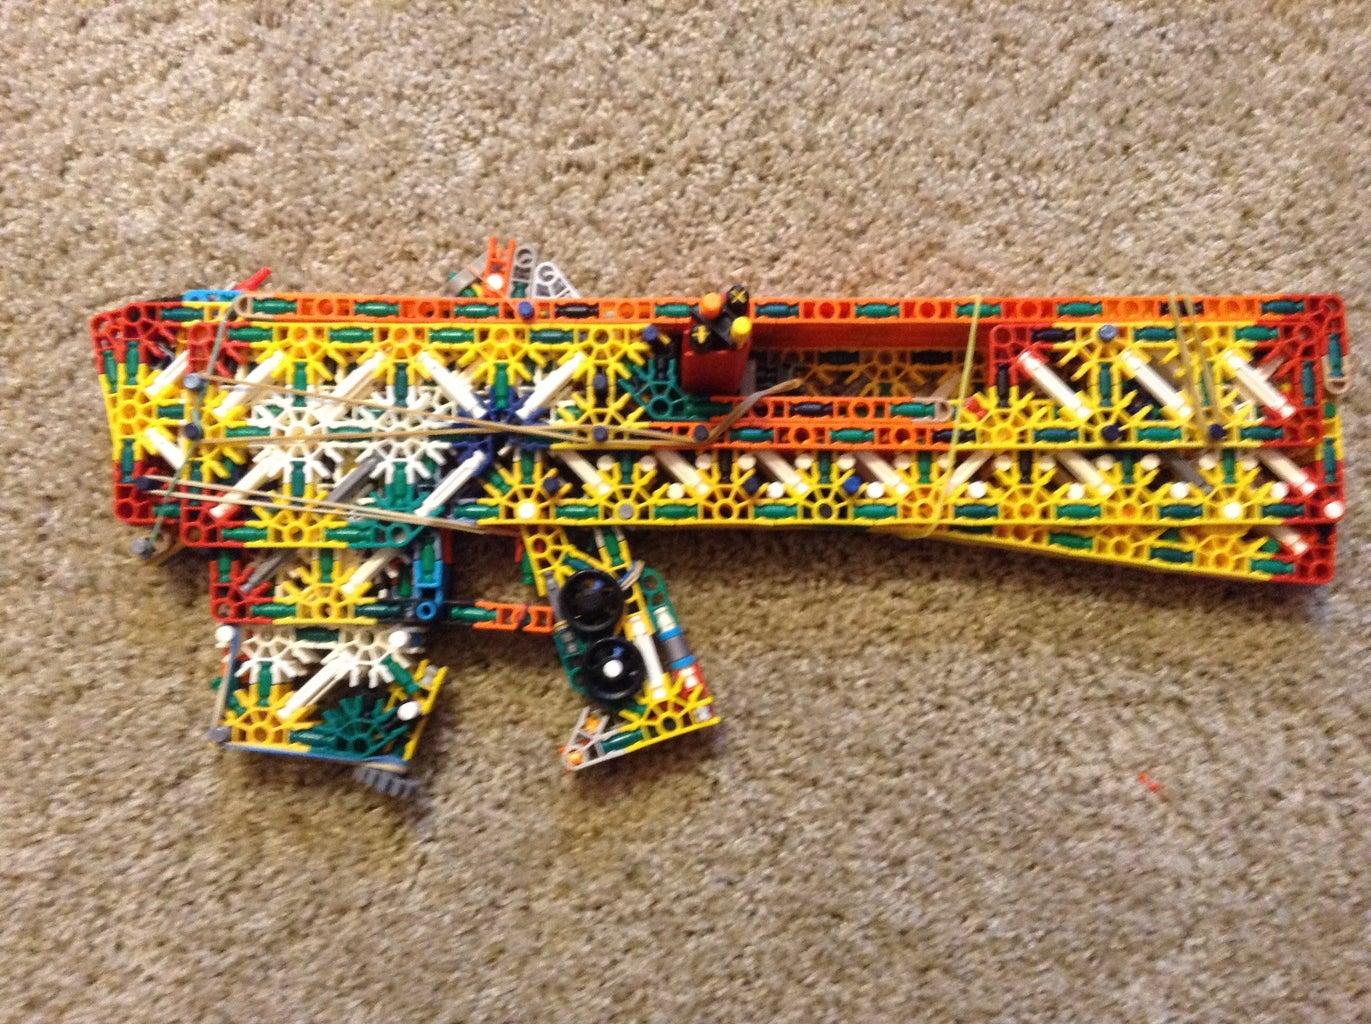 The Takedown Mk III